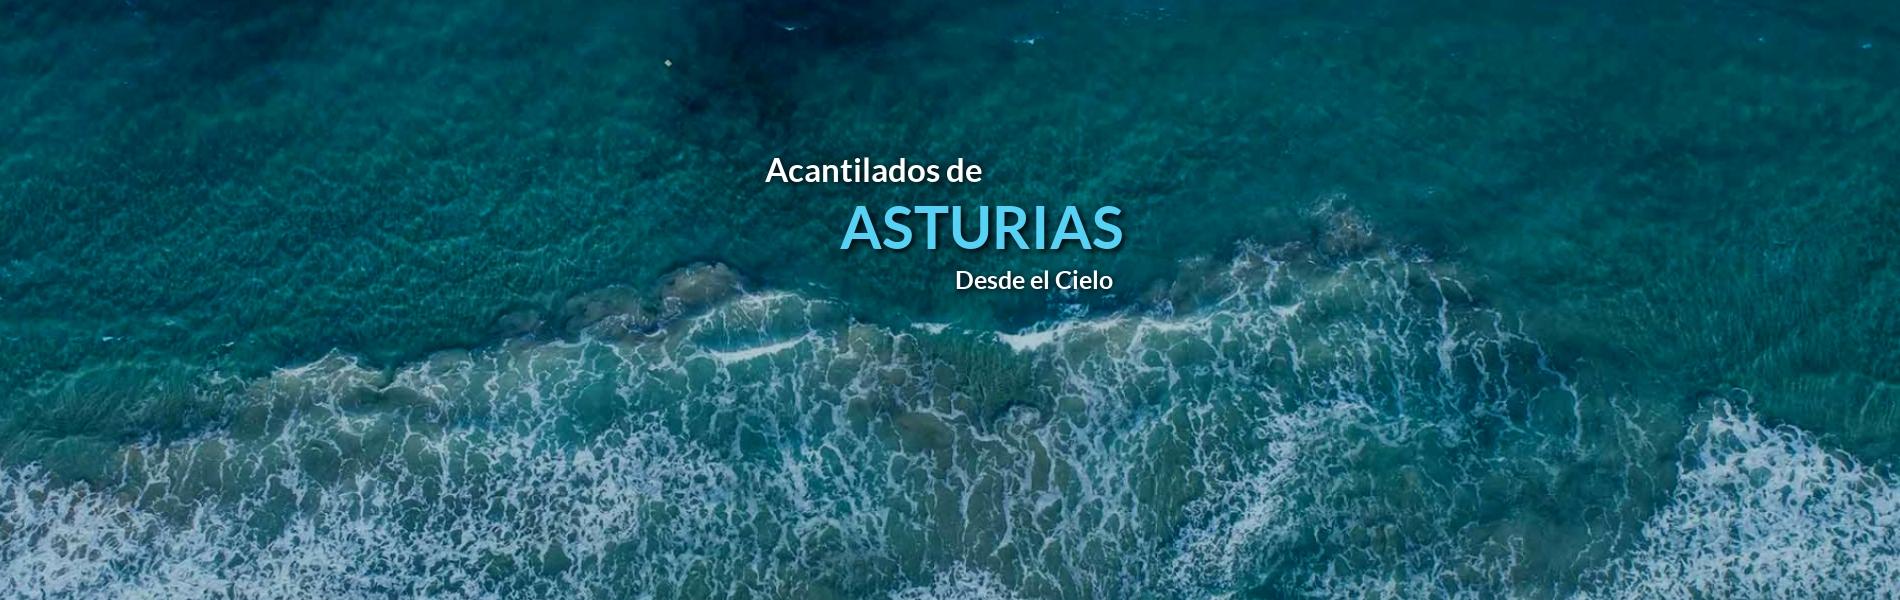 acantilados-asturianos-fotografiados-con-un-dron